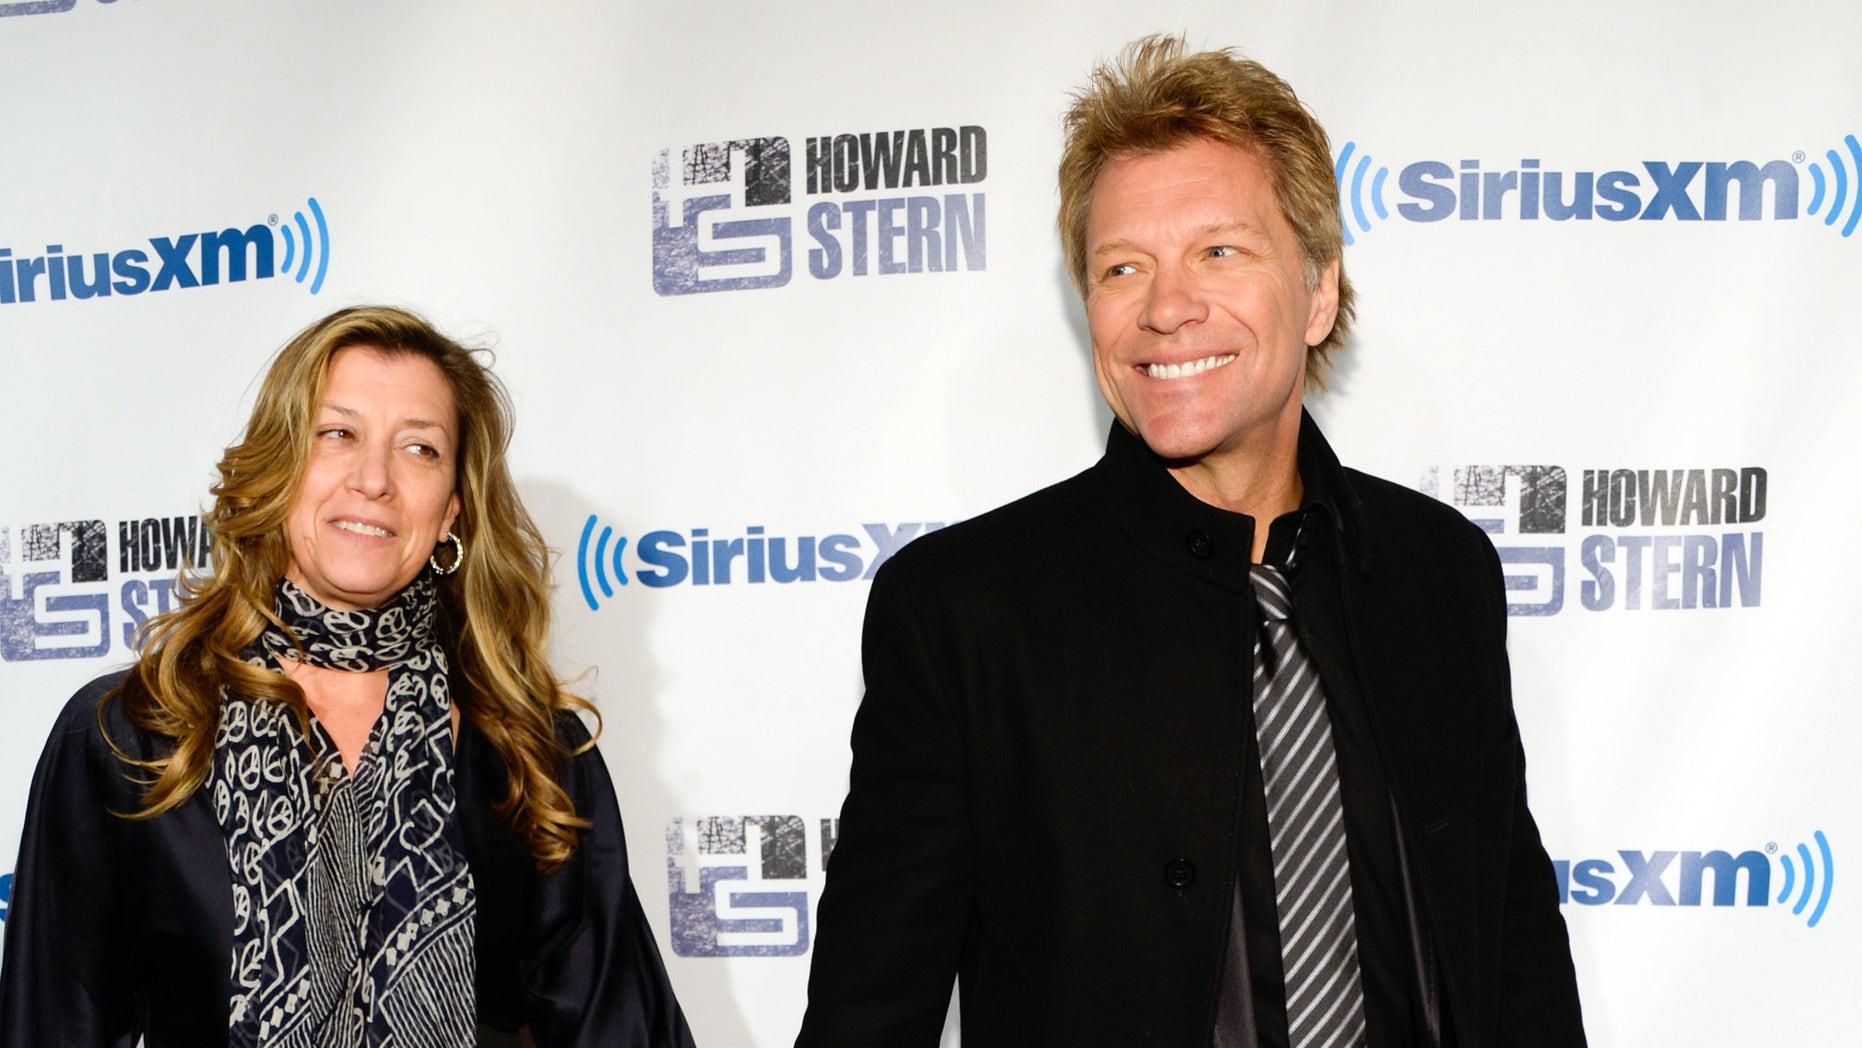 "January 31, 2014. Jon Bon Jovi and wife Dorothea attend ""Howard Stern's Birthday Bash,"" presented by SiriusXM, at the Hammerstein Ballroom in New York City."